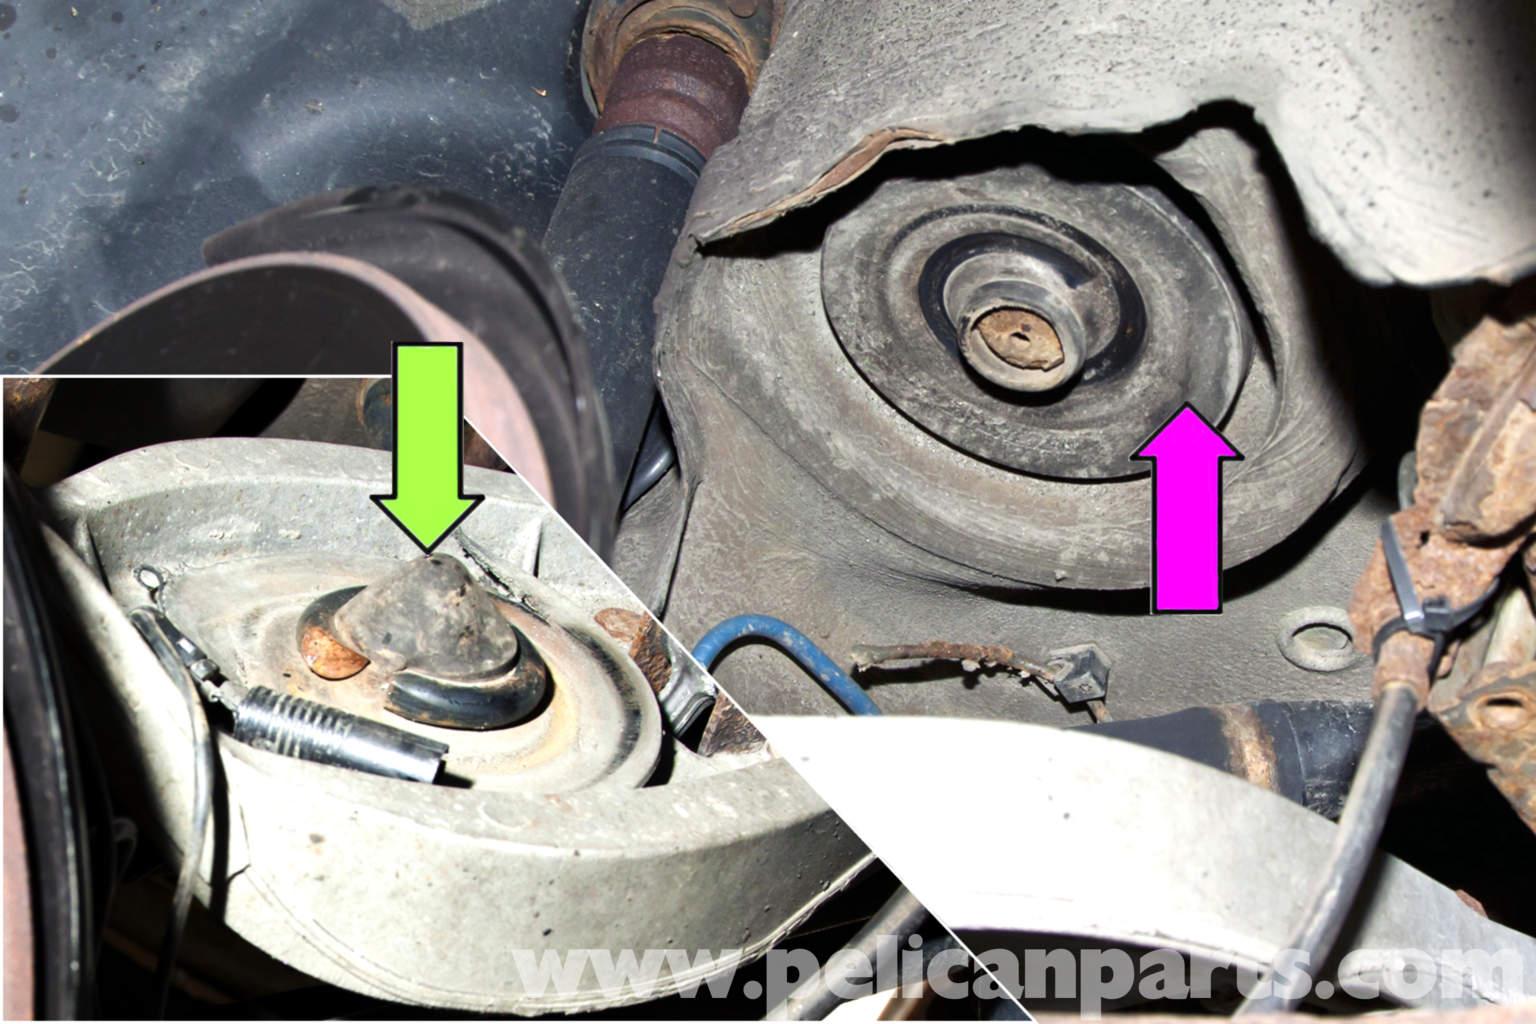 Bmw e46 rear coil spring replacement bmw 325i 2001 2005 bmw 325xi 2001 2005 bmw 325ci